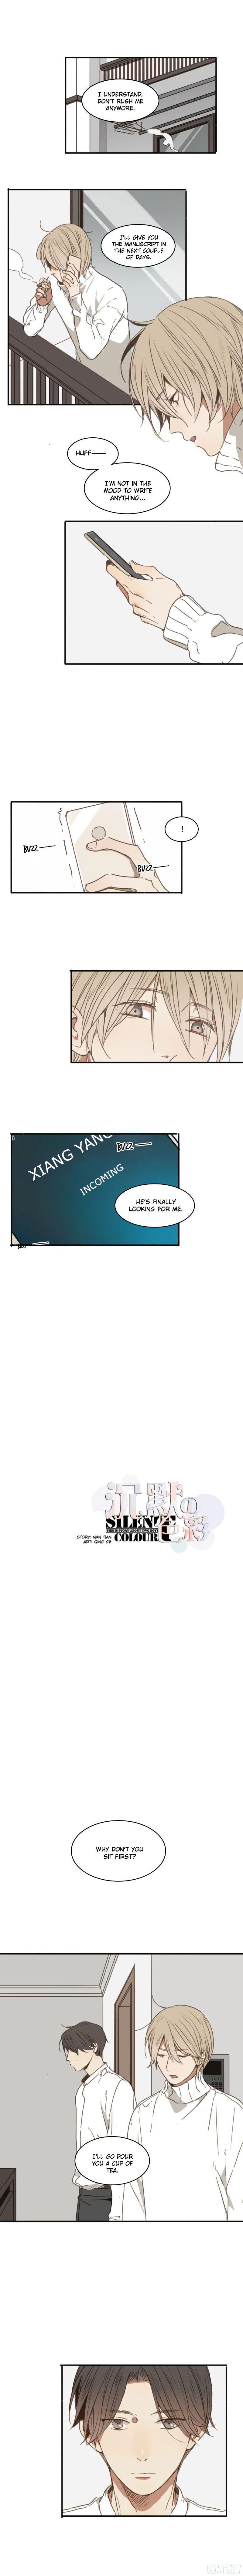 https://im.nineanime.com/comics/pic9/57/20473/494446/80568f6743b6126cb61be9f97c55ba85.jpg Page 1